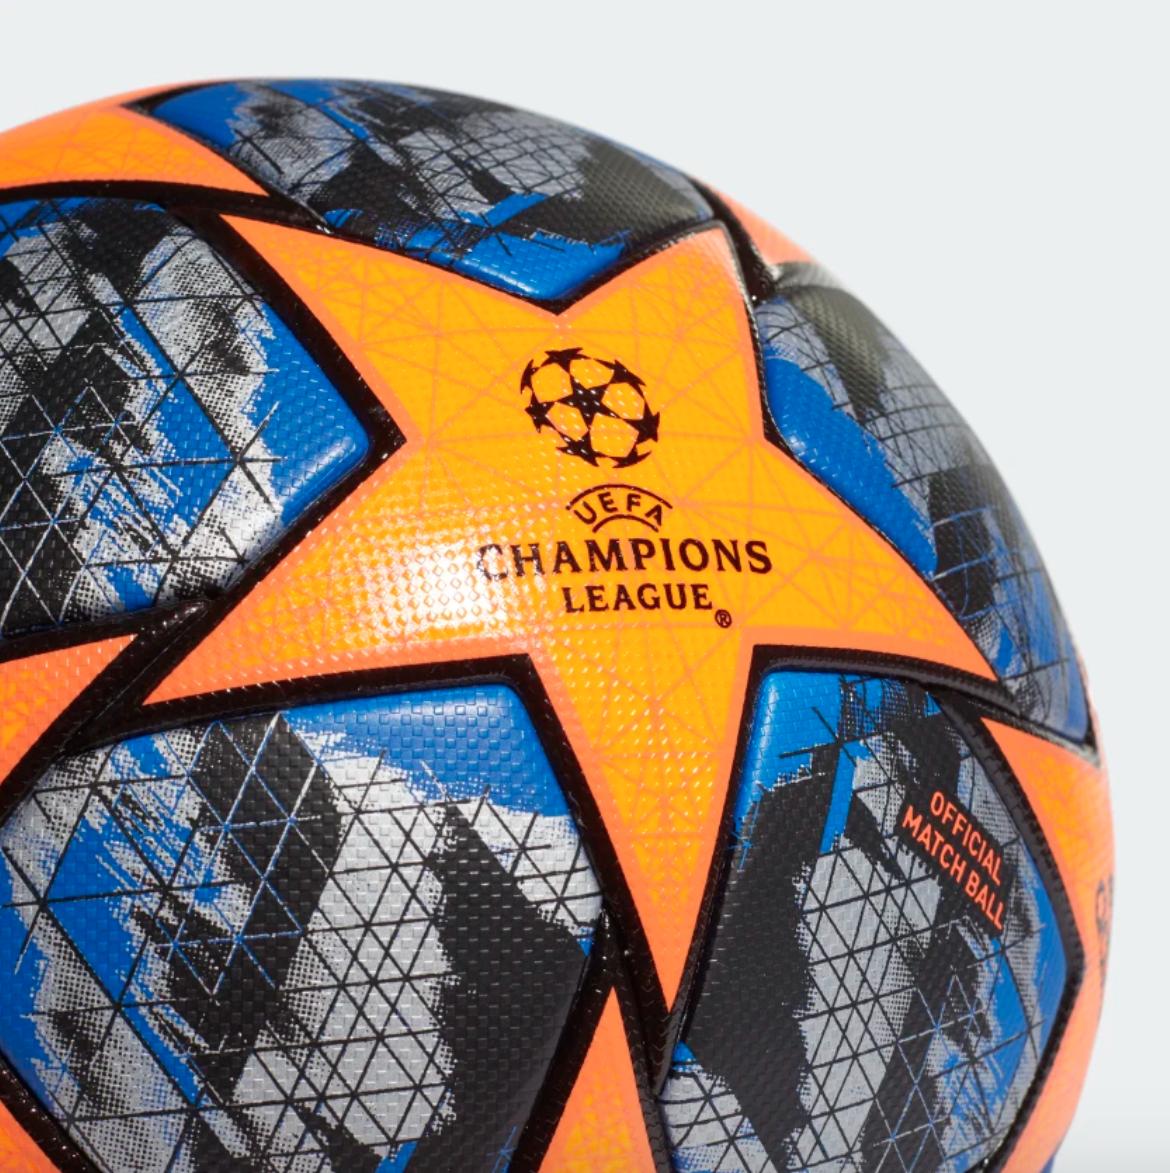 ballon-hiver-ligue-des-champions-2019-2020-adidas-1